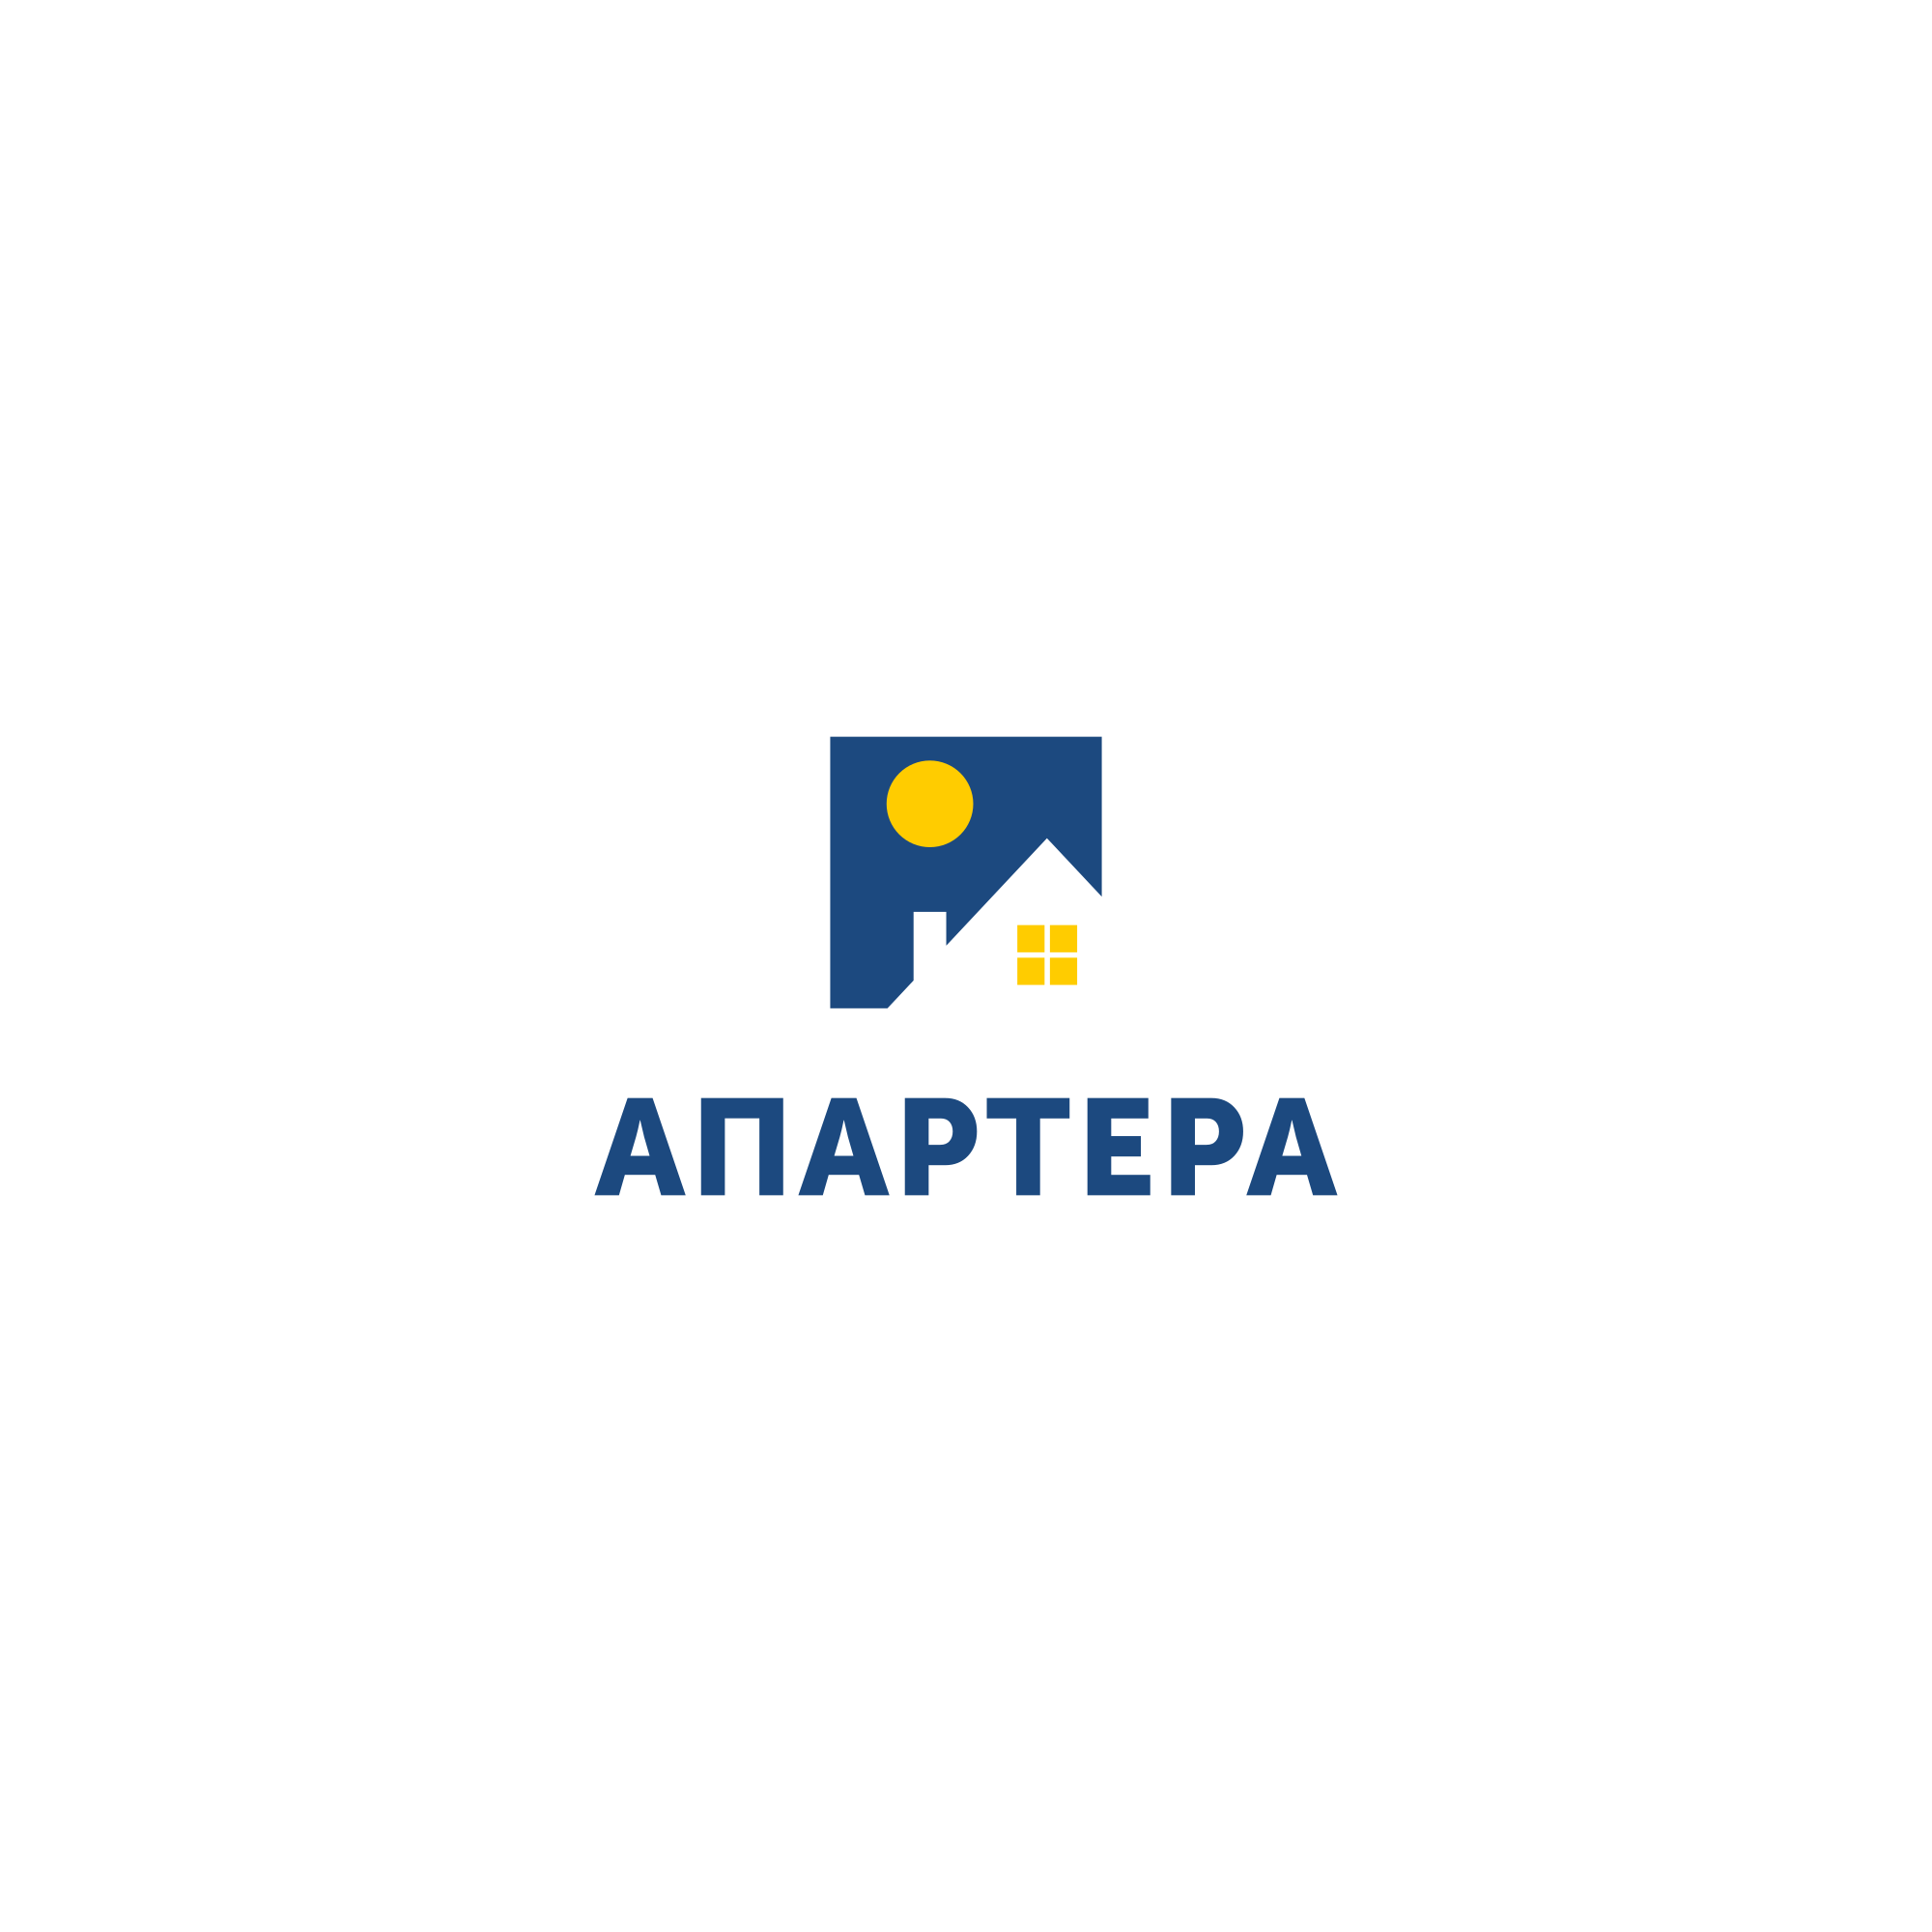 Логотип для управляющей компании  фото f_4515b749416a43a3.png